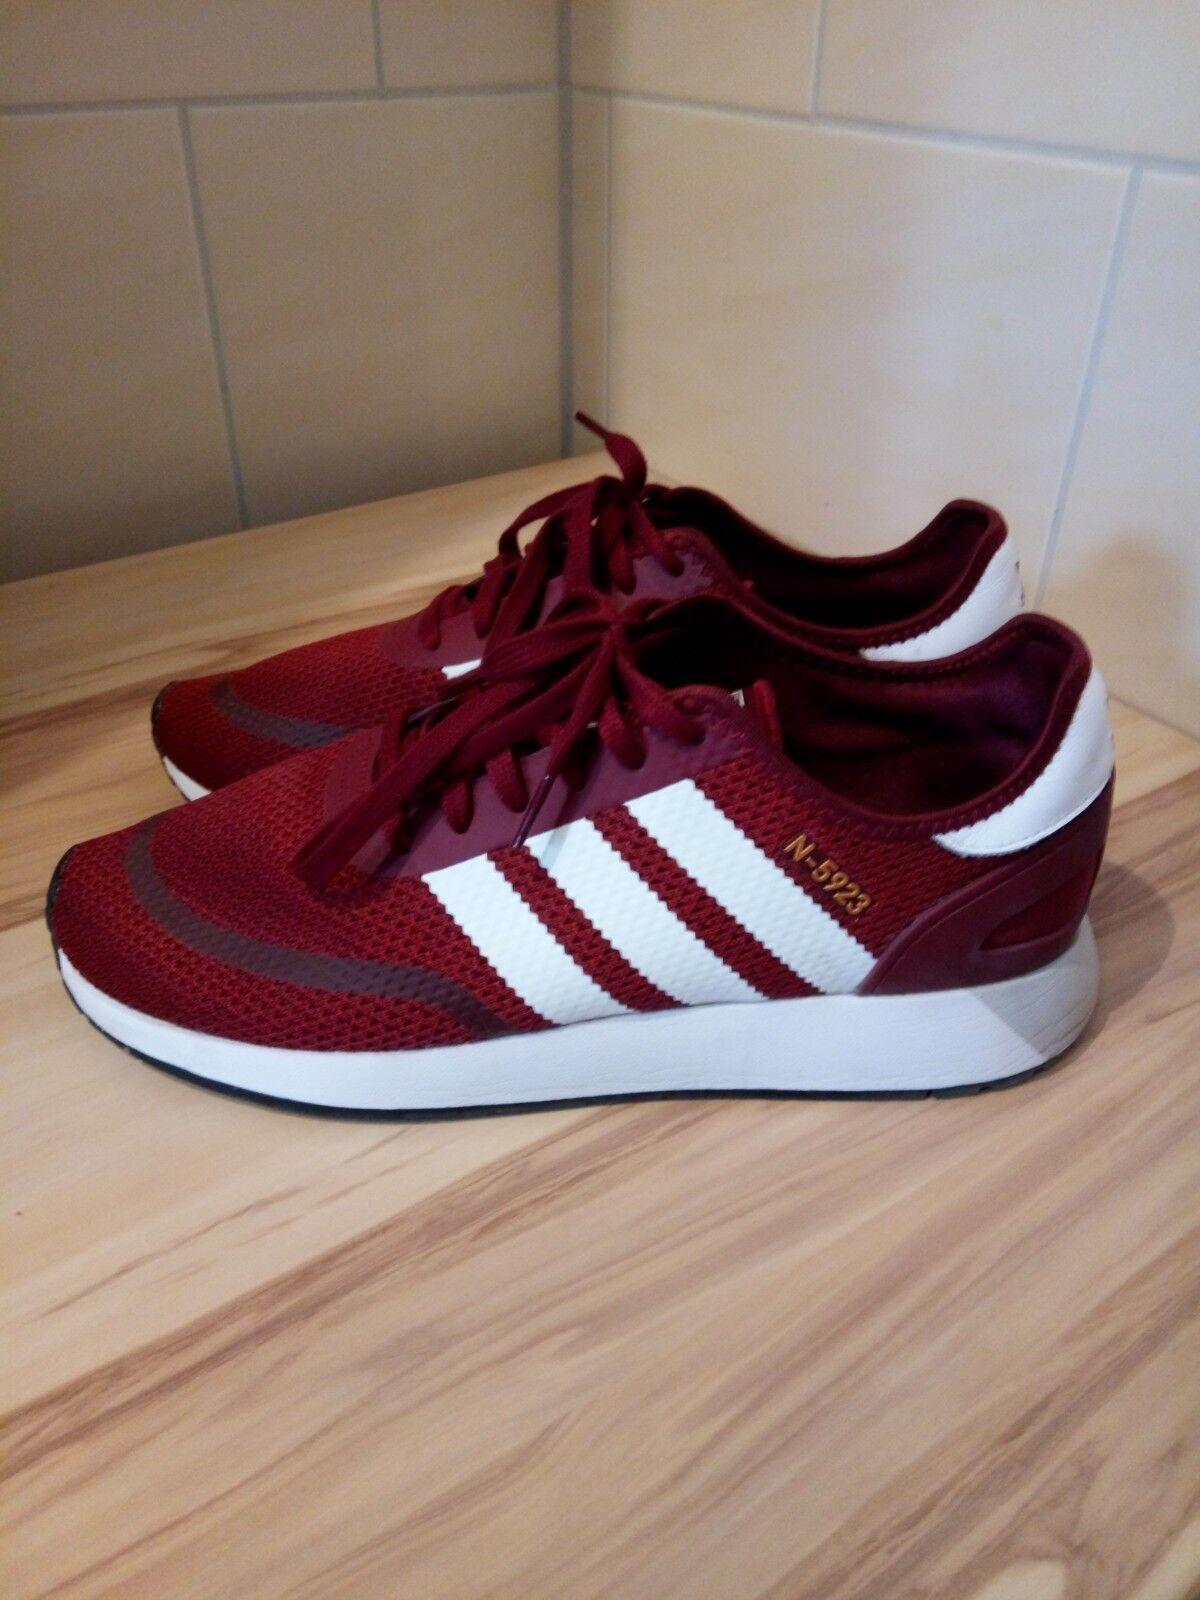 Adidas ultraboost i 5923 44 2/3 rot sneaker nmd ultraboost Adidas iniki 056872